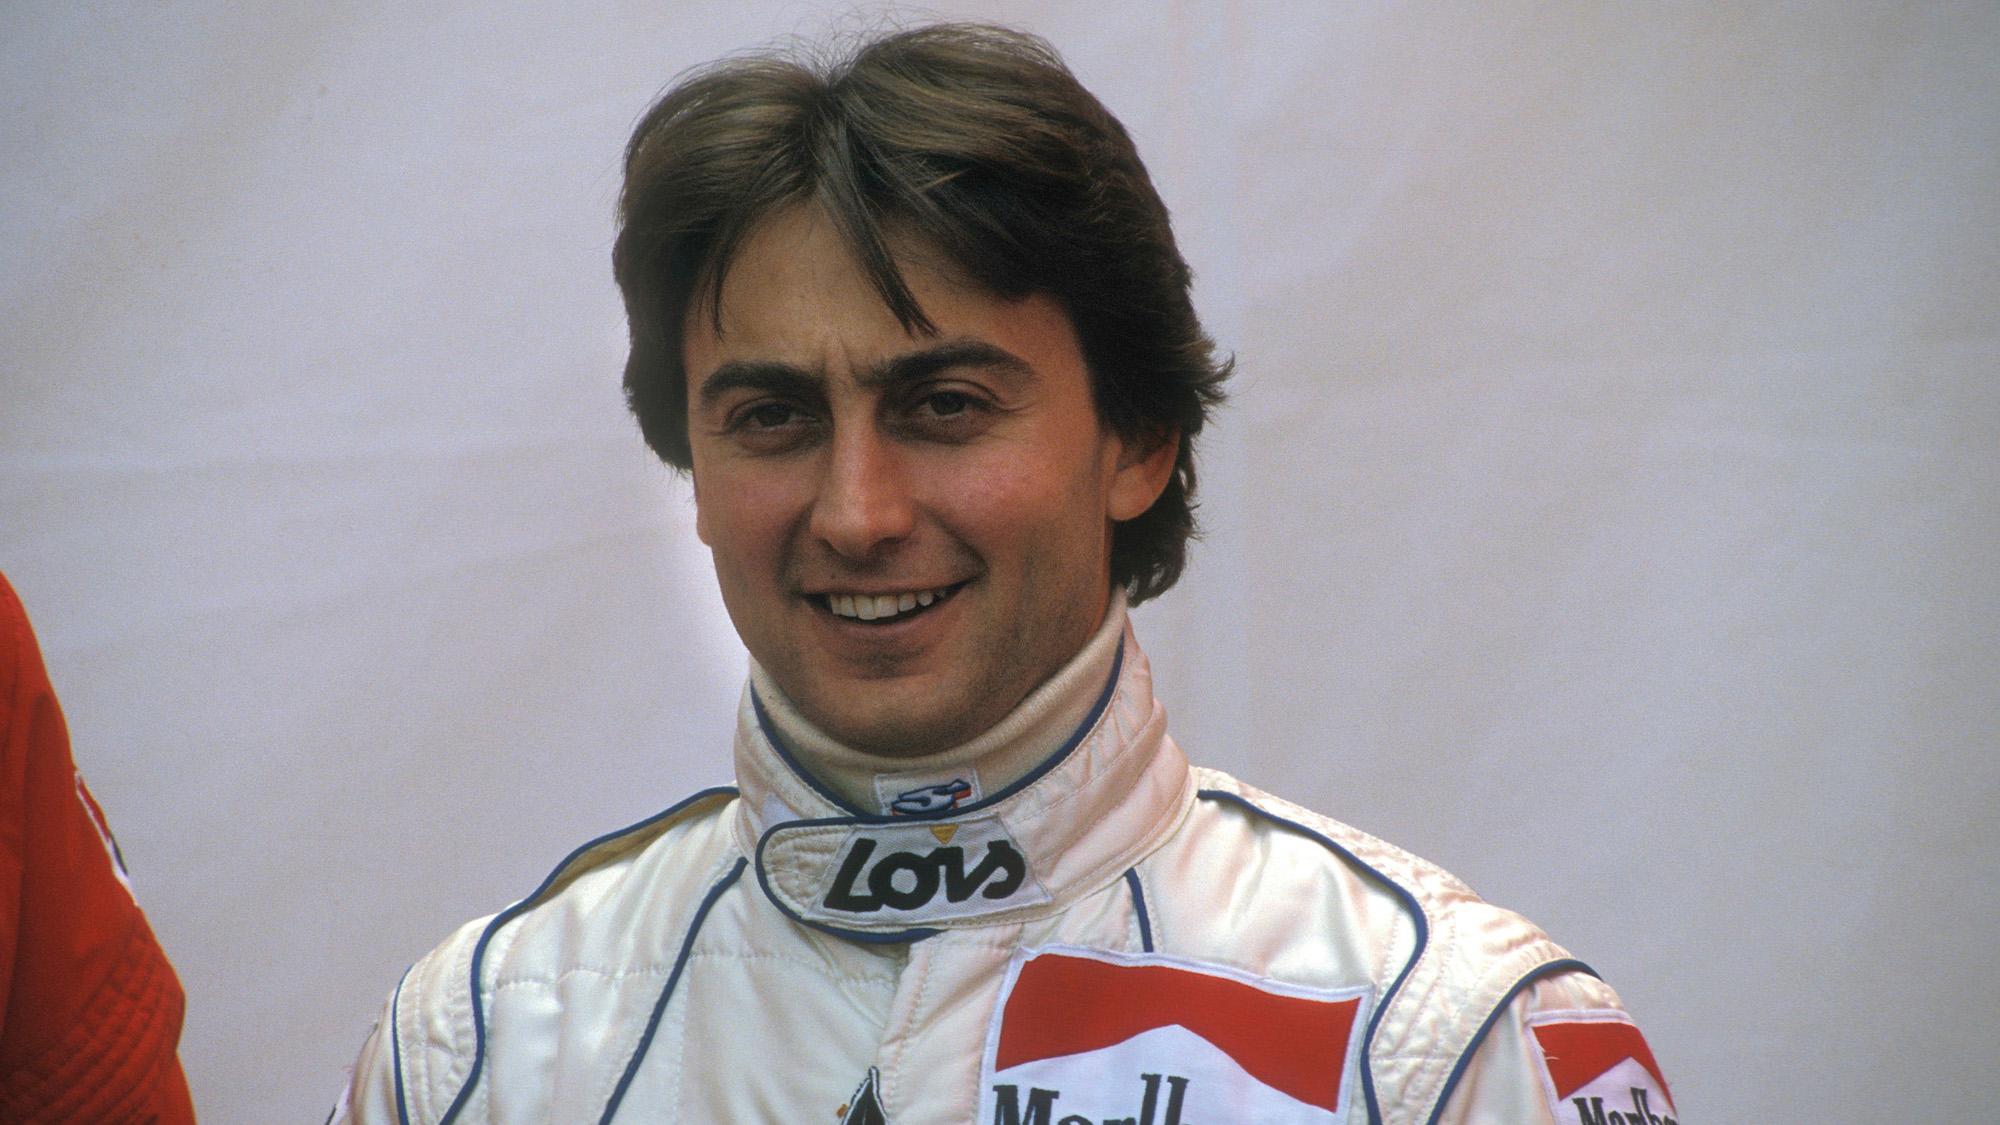 Adrian Campos as a Minardi F1 driver